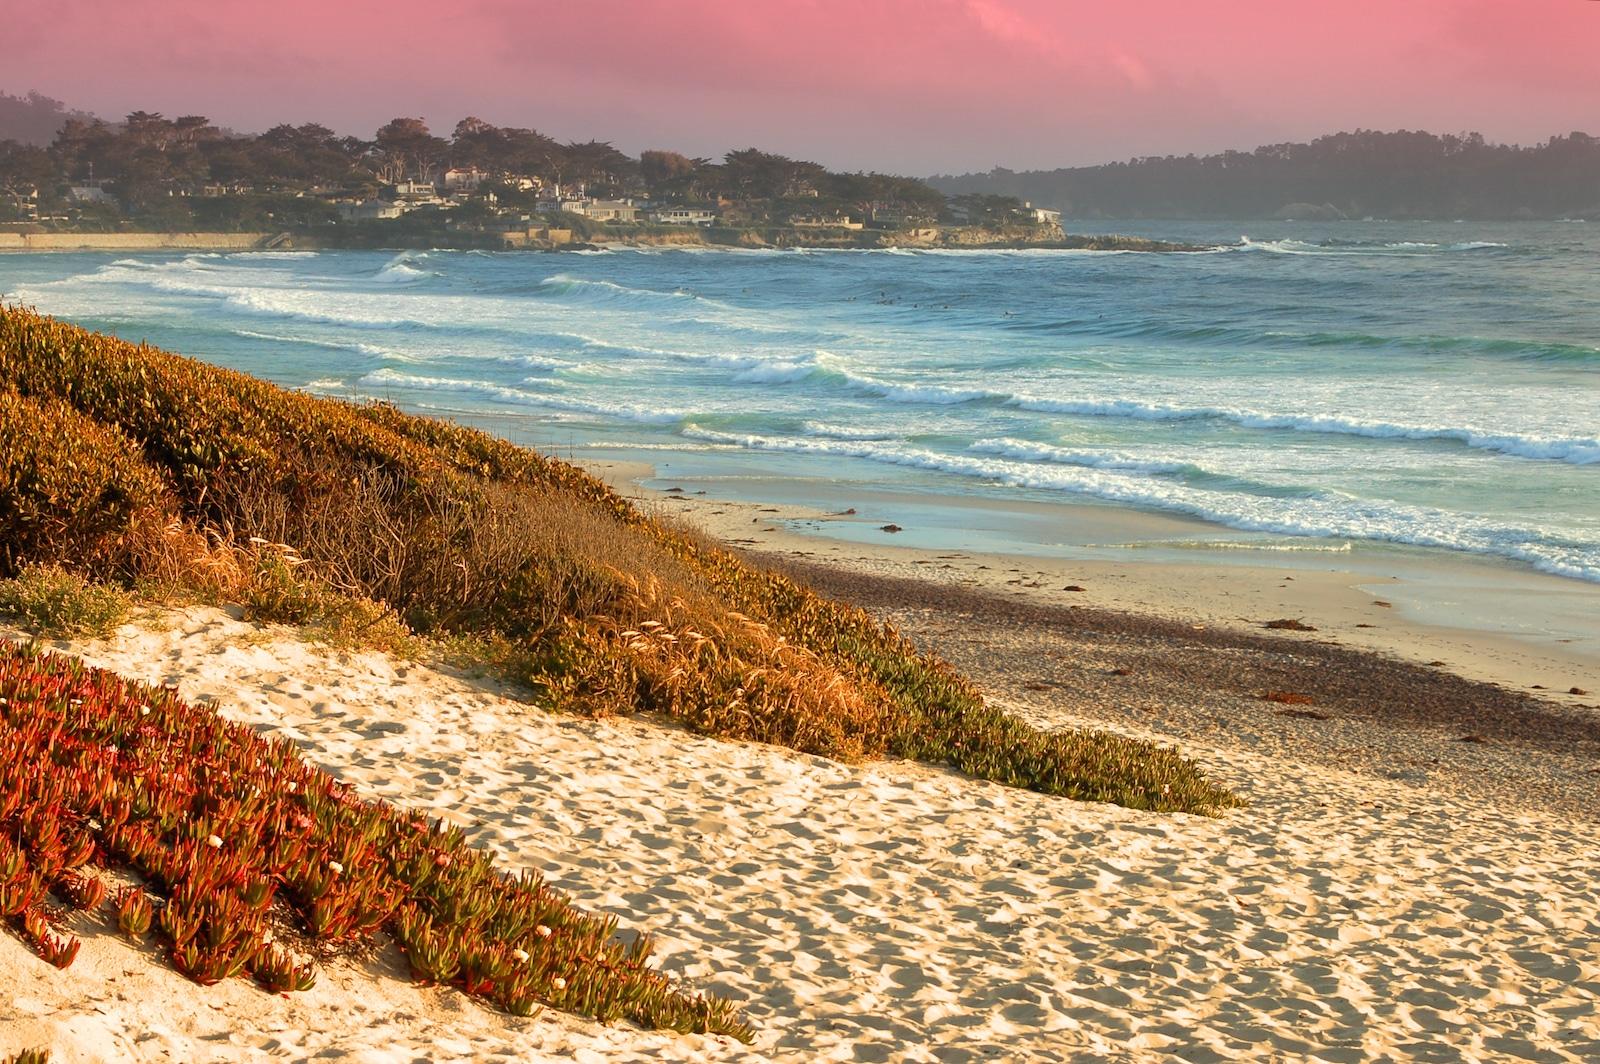 culinary amp cultural finds in carmel by the sea california